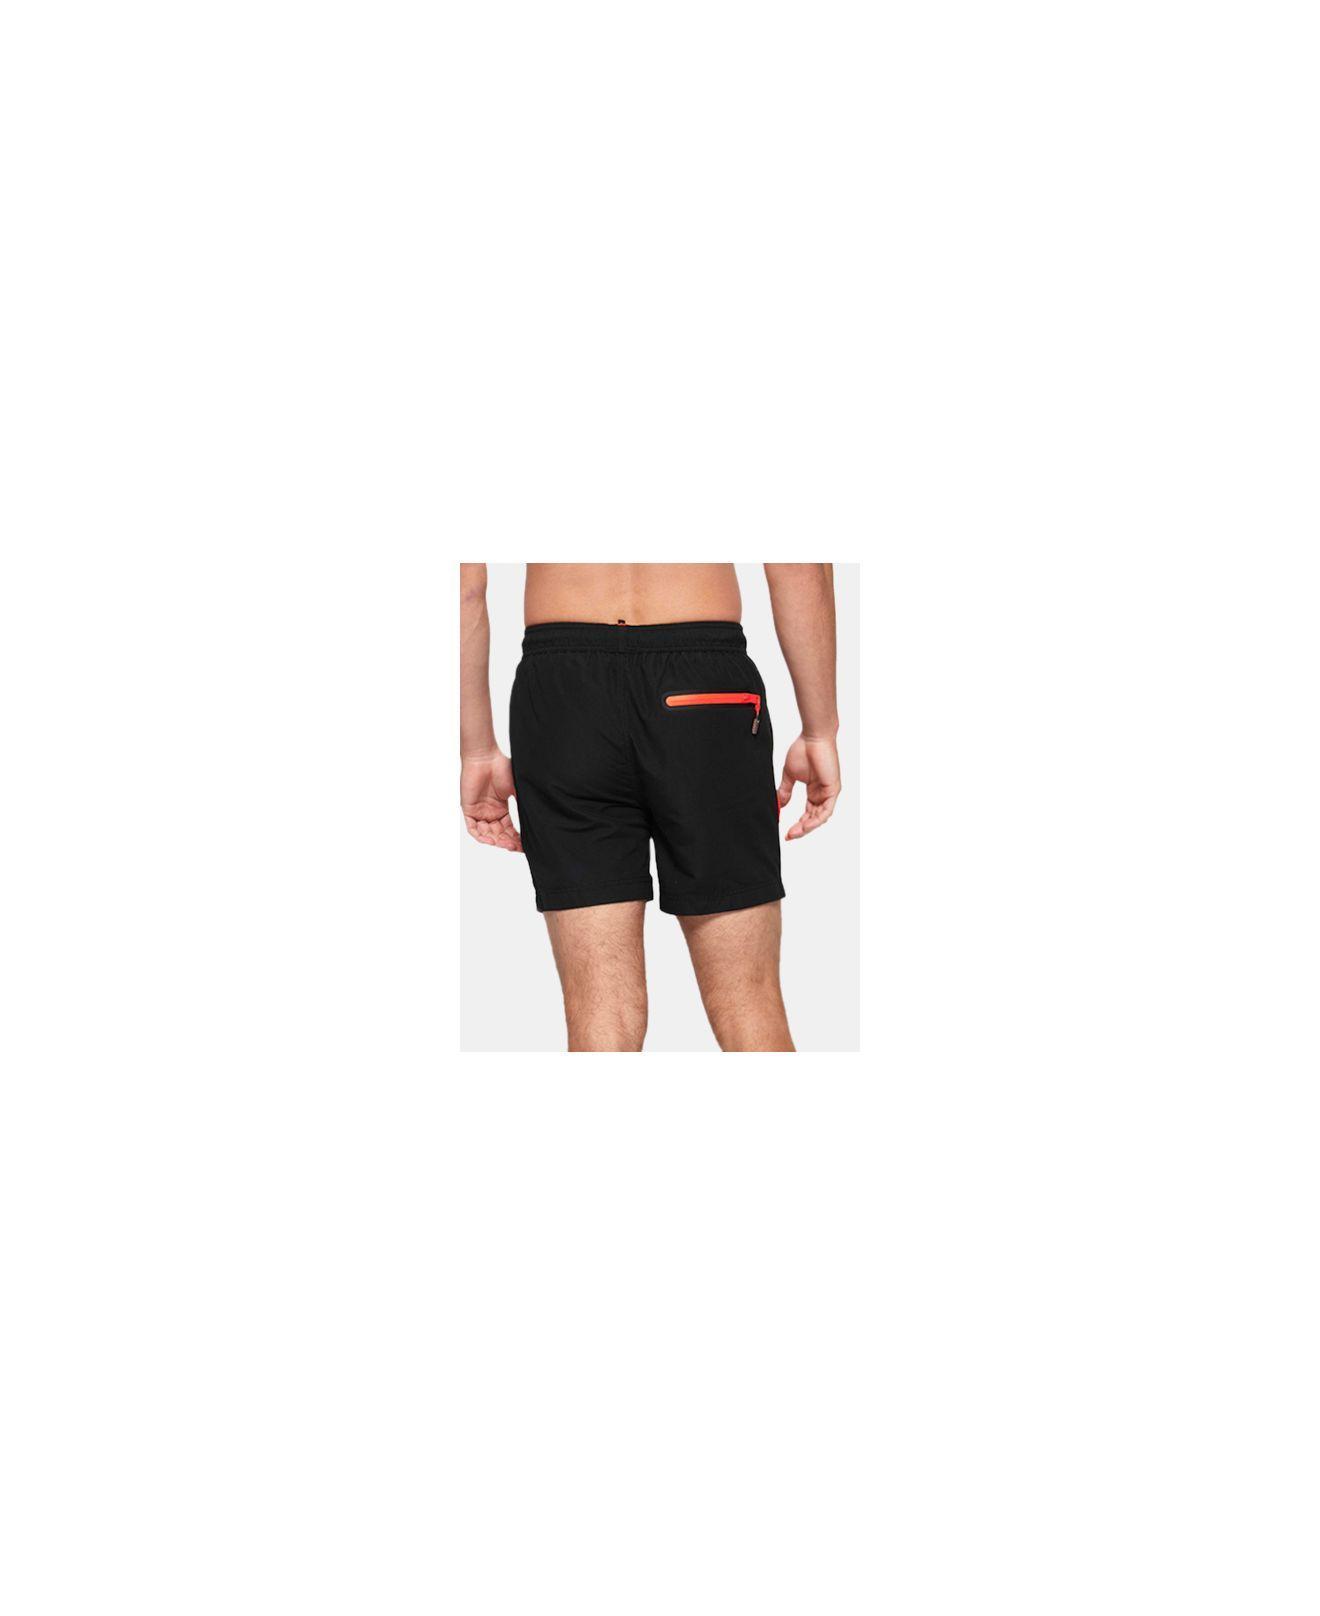 For Men Lyst Black Swim Beach Superdry Volley Shorts In w0OPn8k